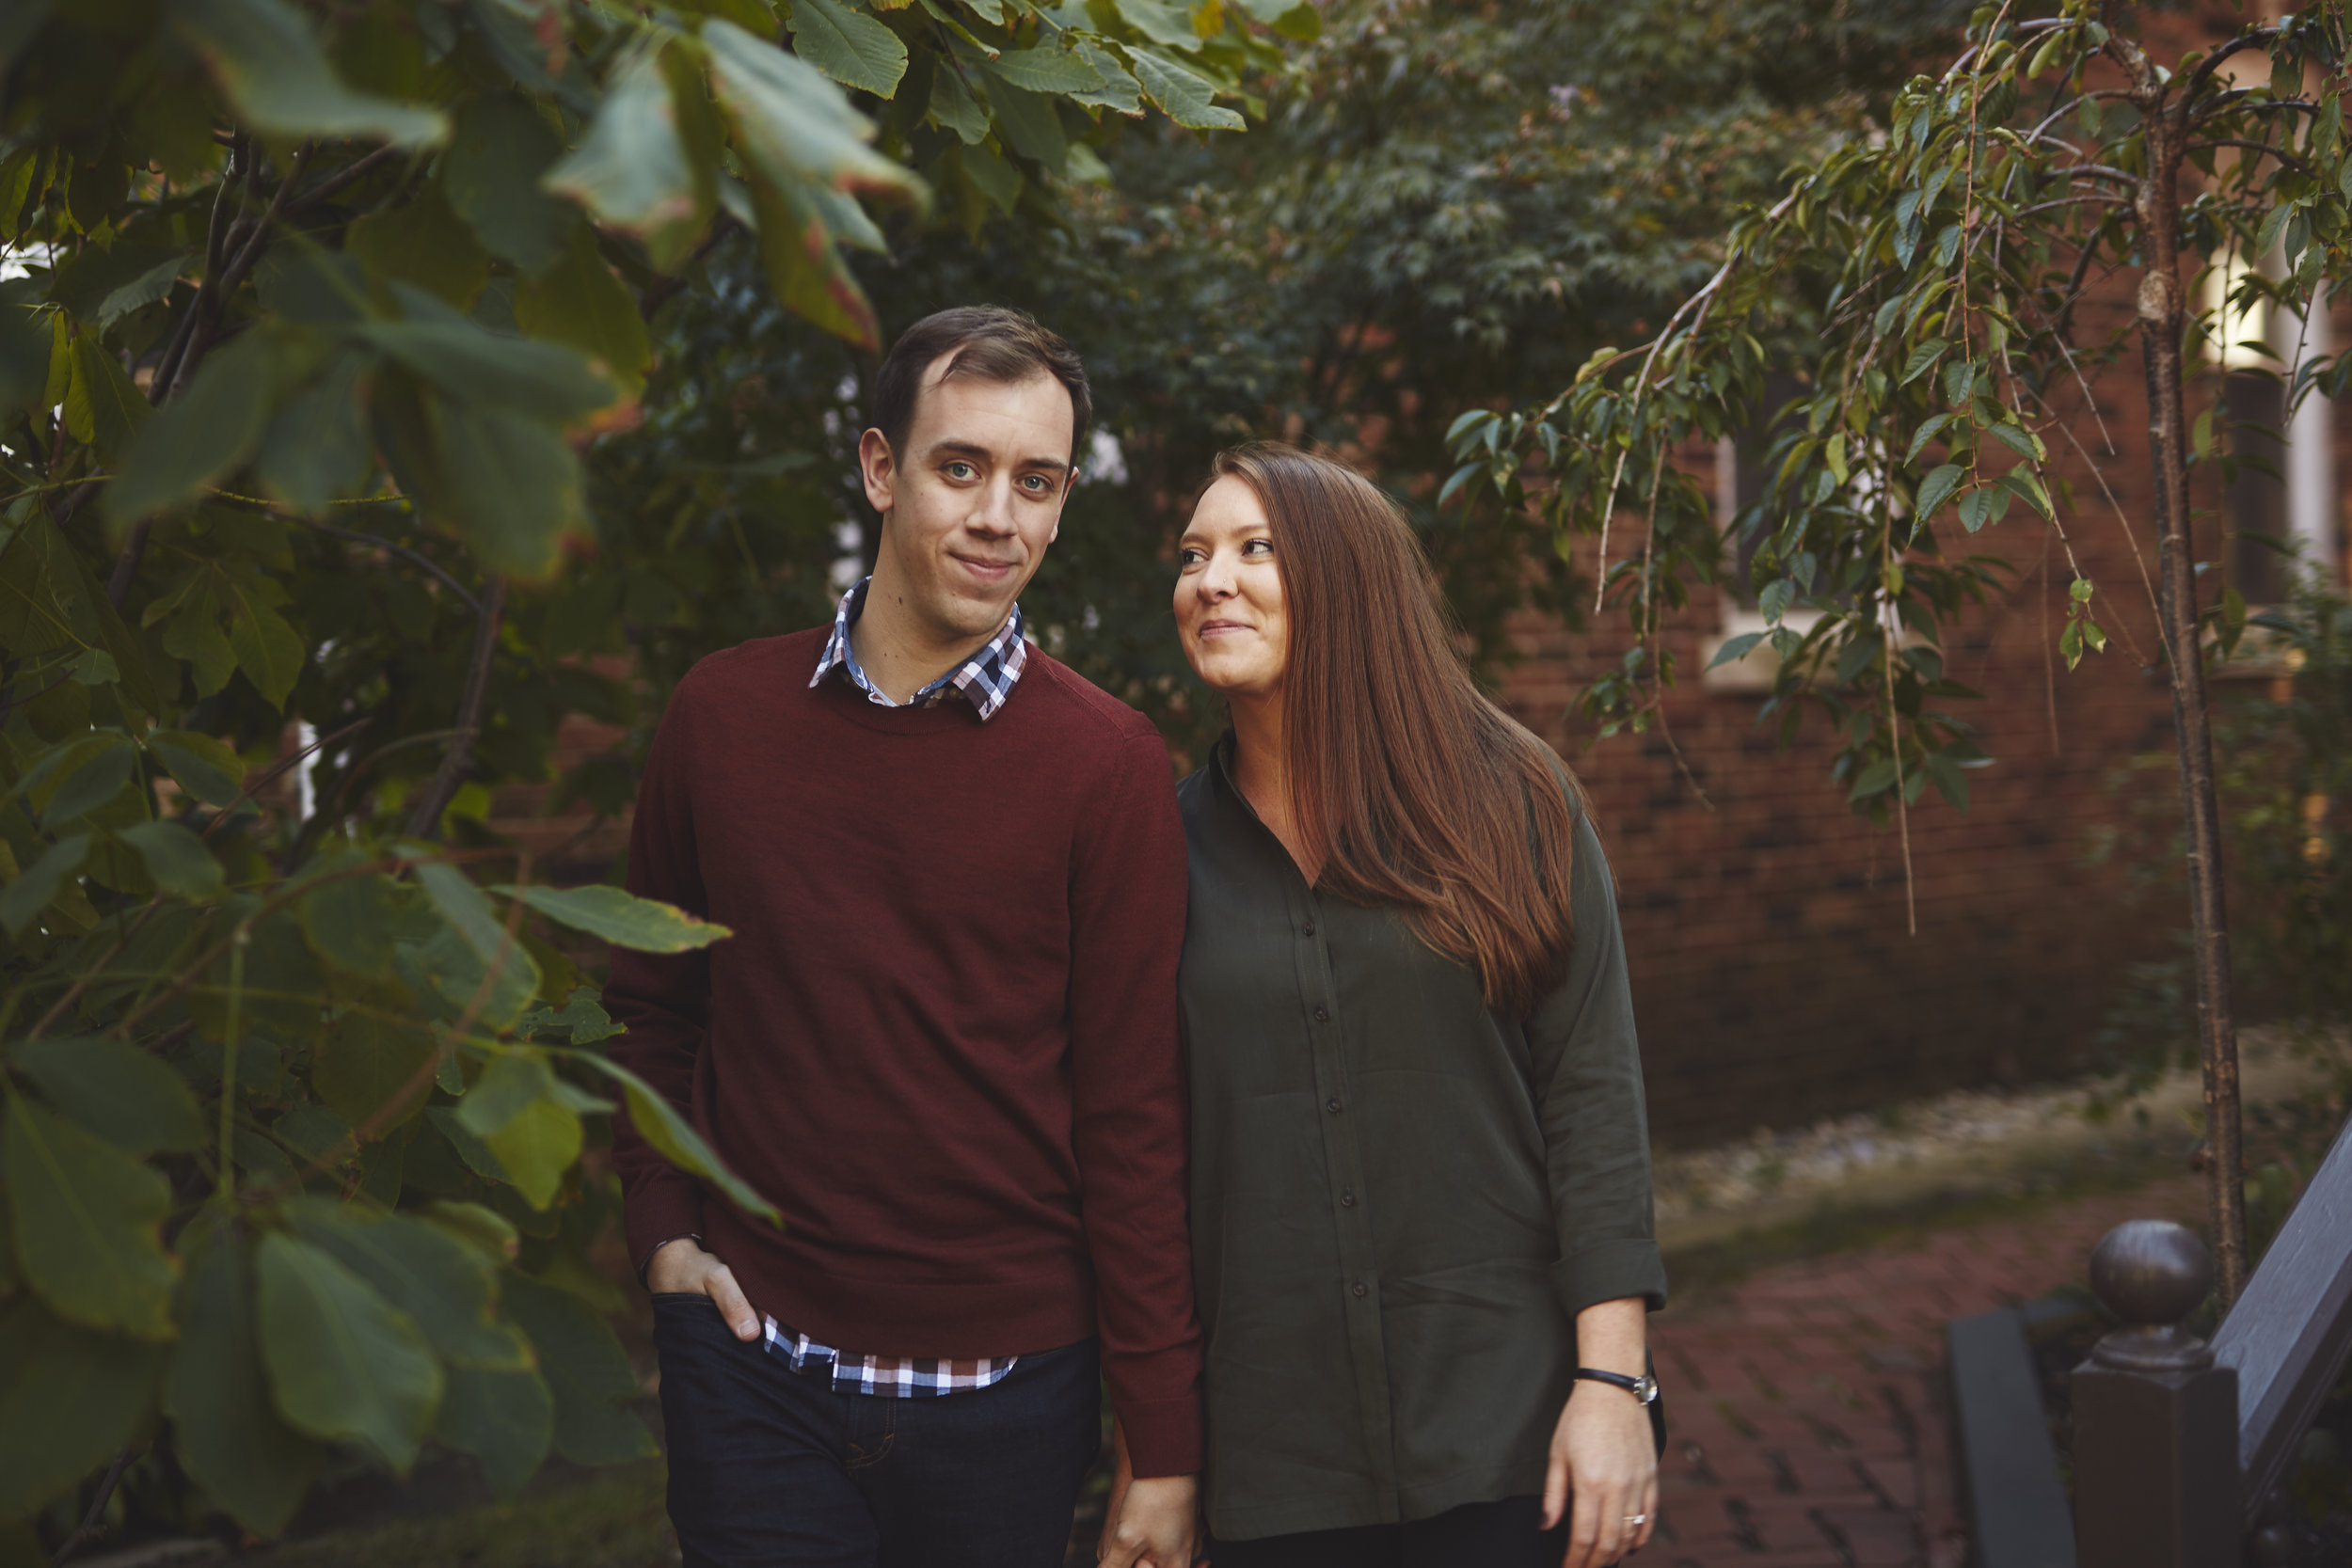 Troy & Kathleen - benromangphoto - 6I5A0499.jpg